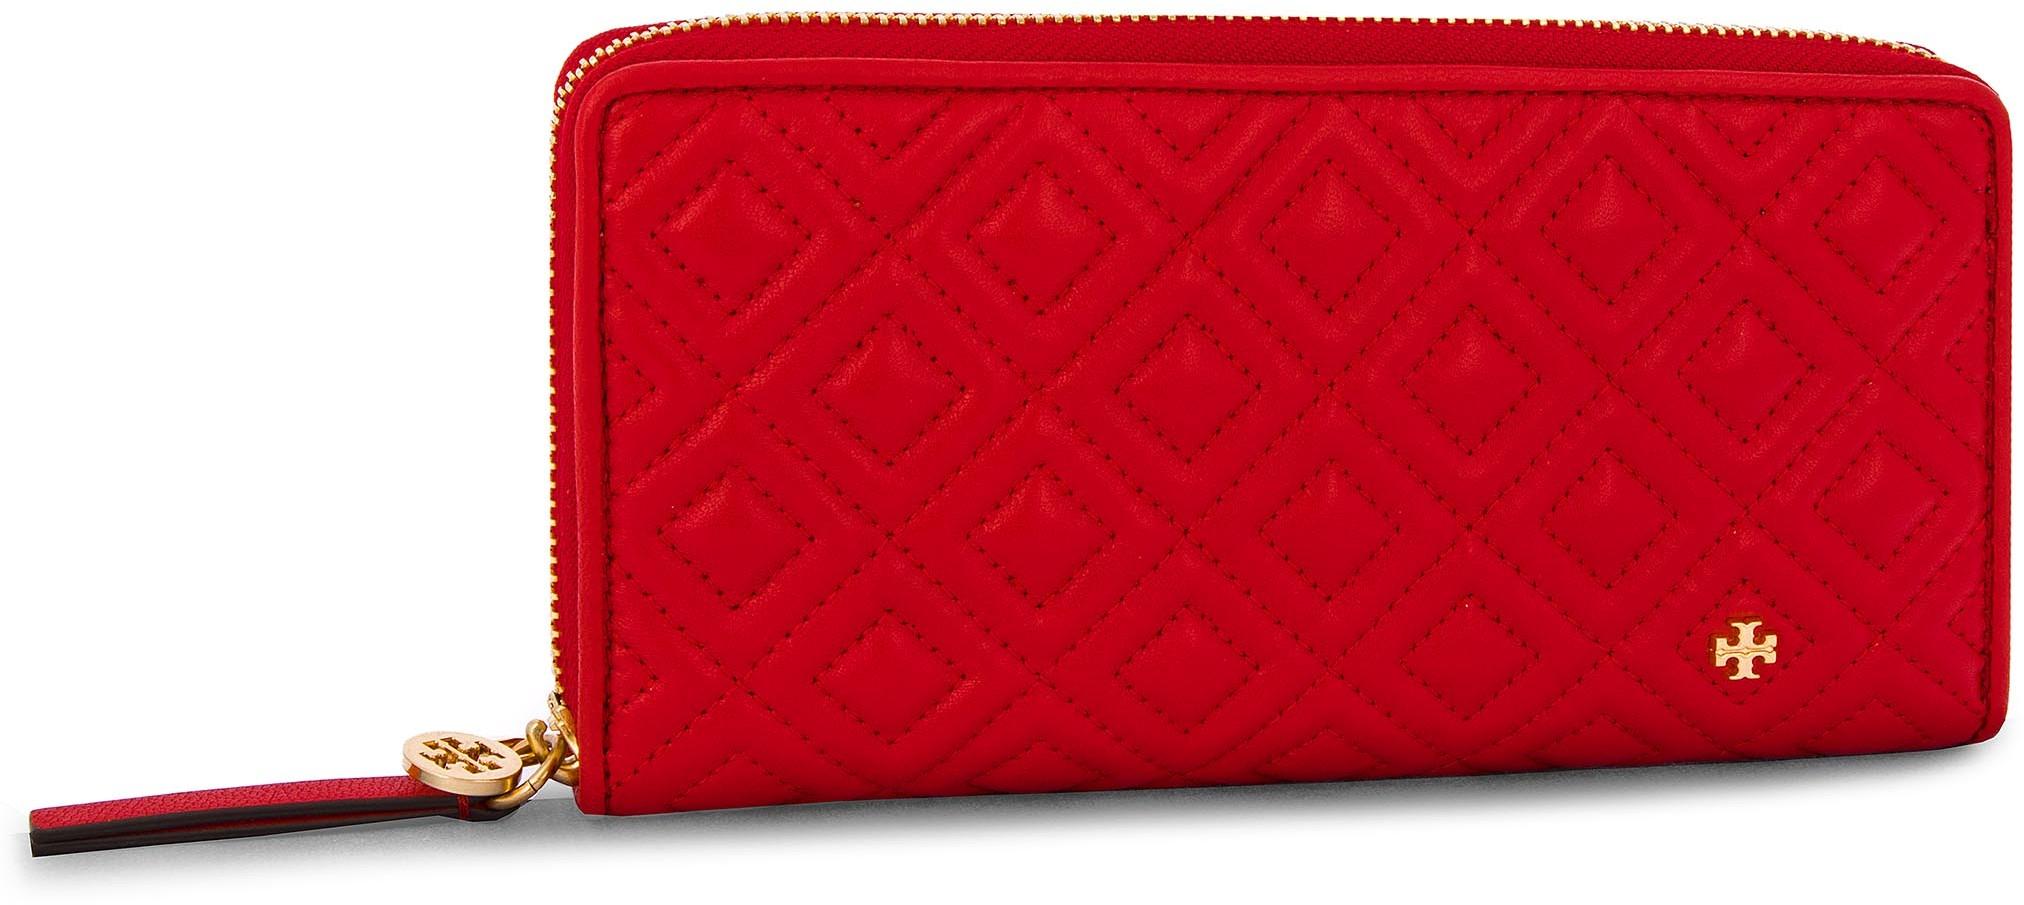 c938058ea0c52 Tory Burch Duży Portfel Damski TORY BURCH - Fleming Zip Continental Wallet  46542 Brilliant Red 612